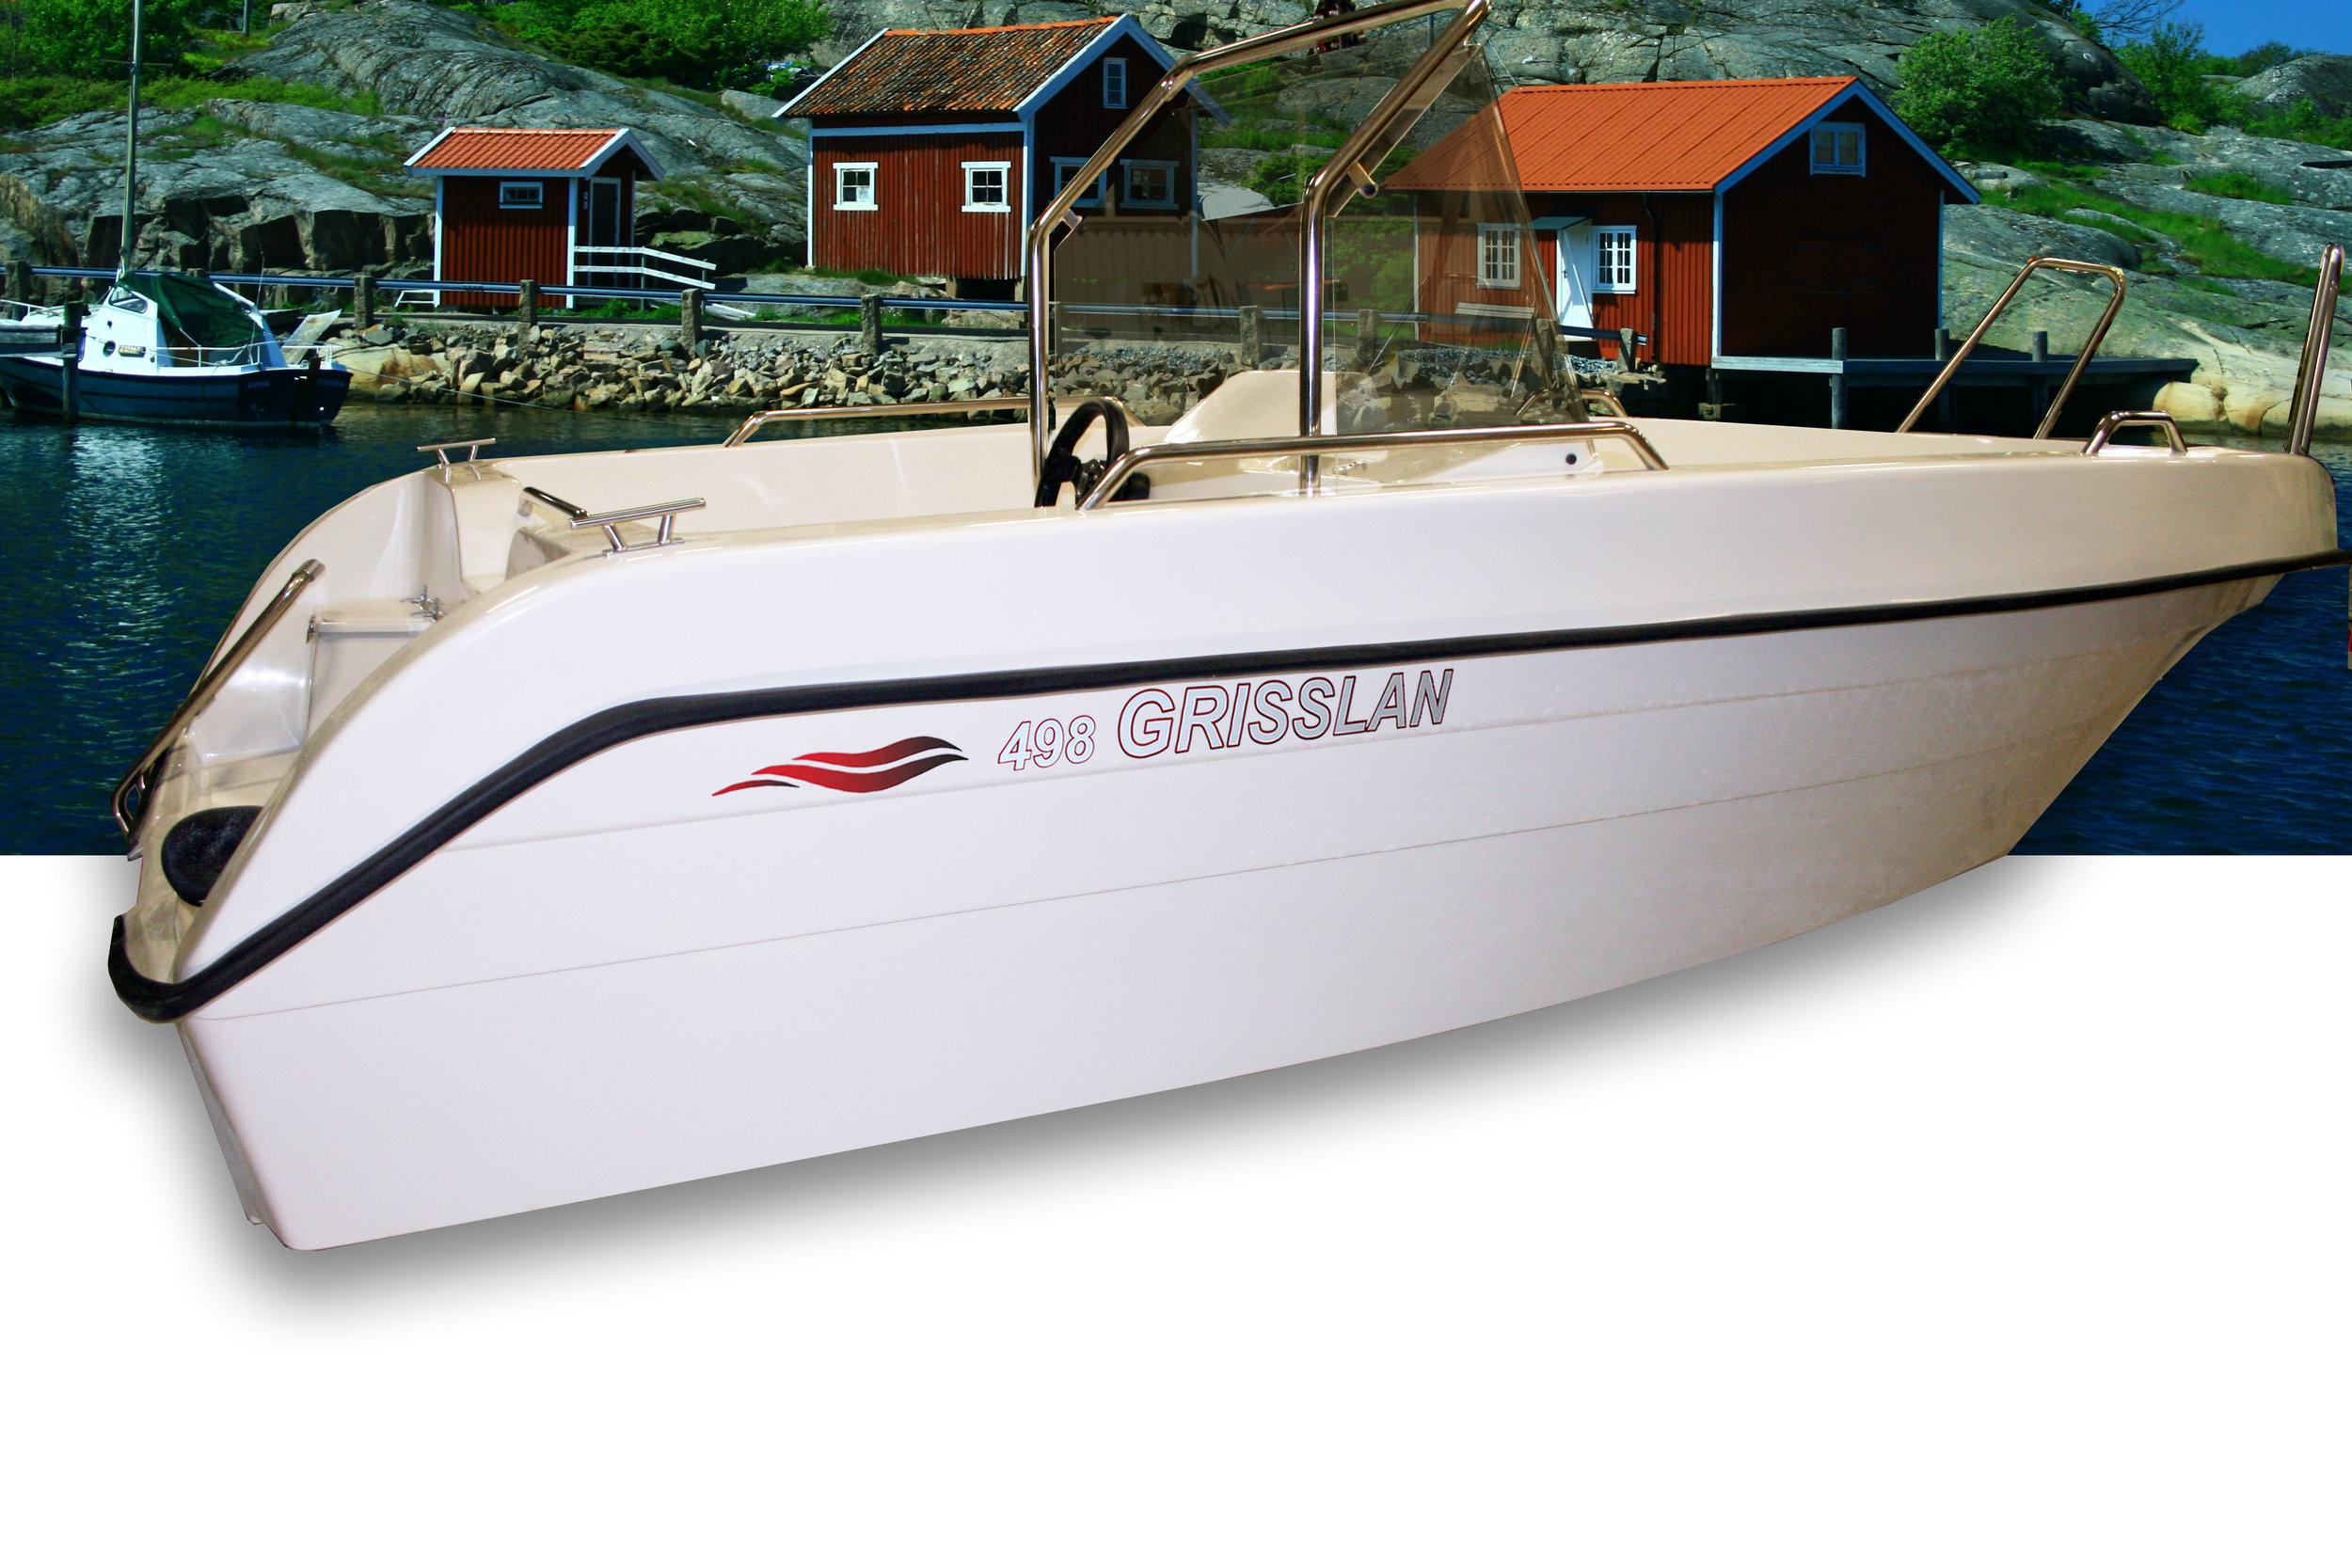 498 frilagd båt.jpg